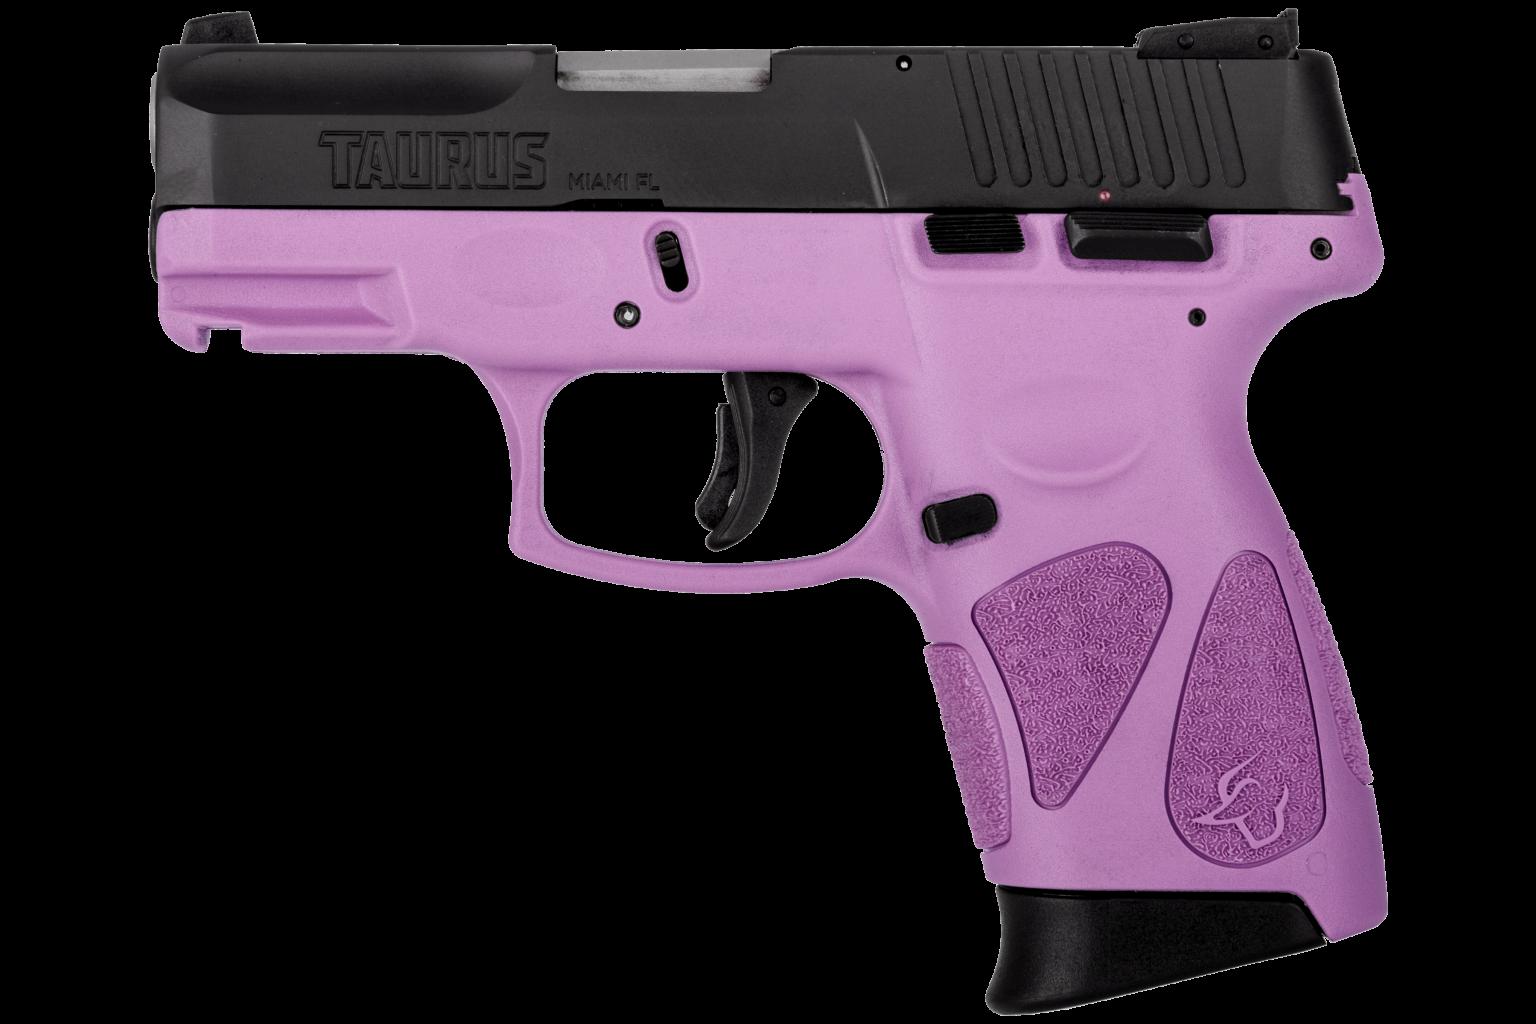 taurus-g2c-9mmp-light-purple